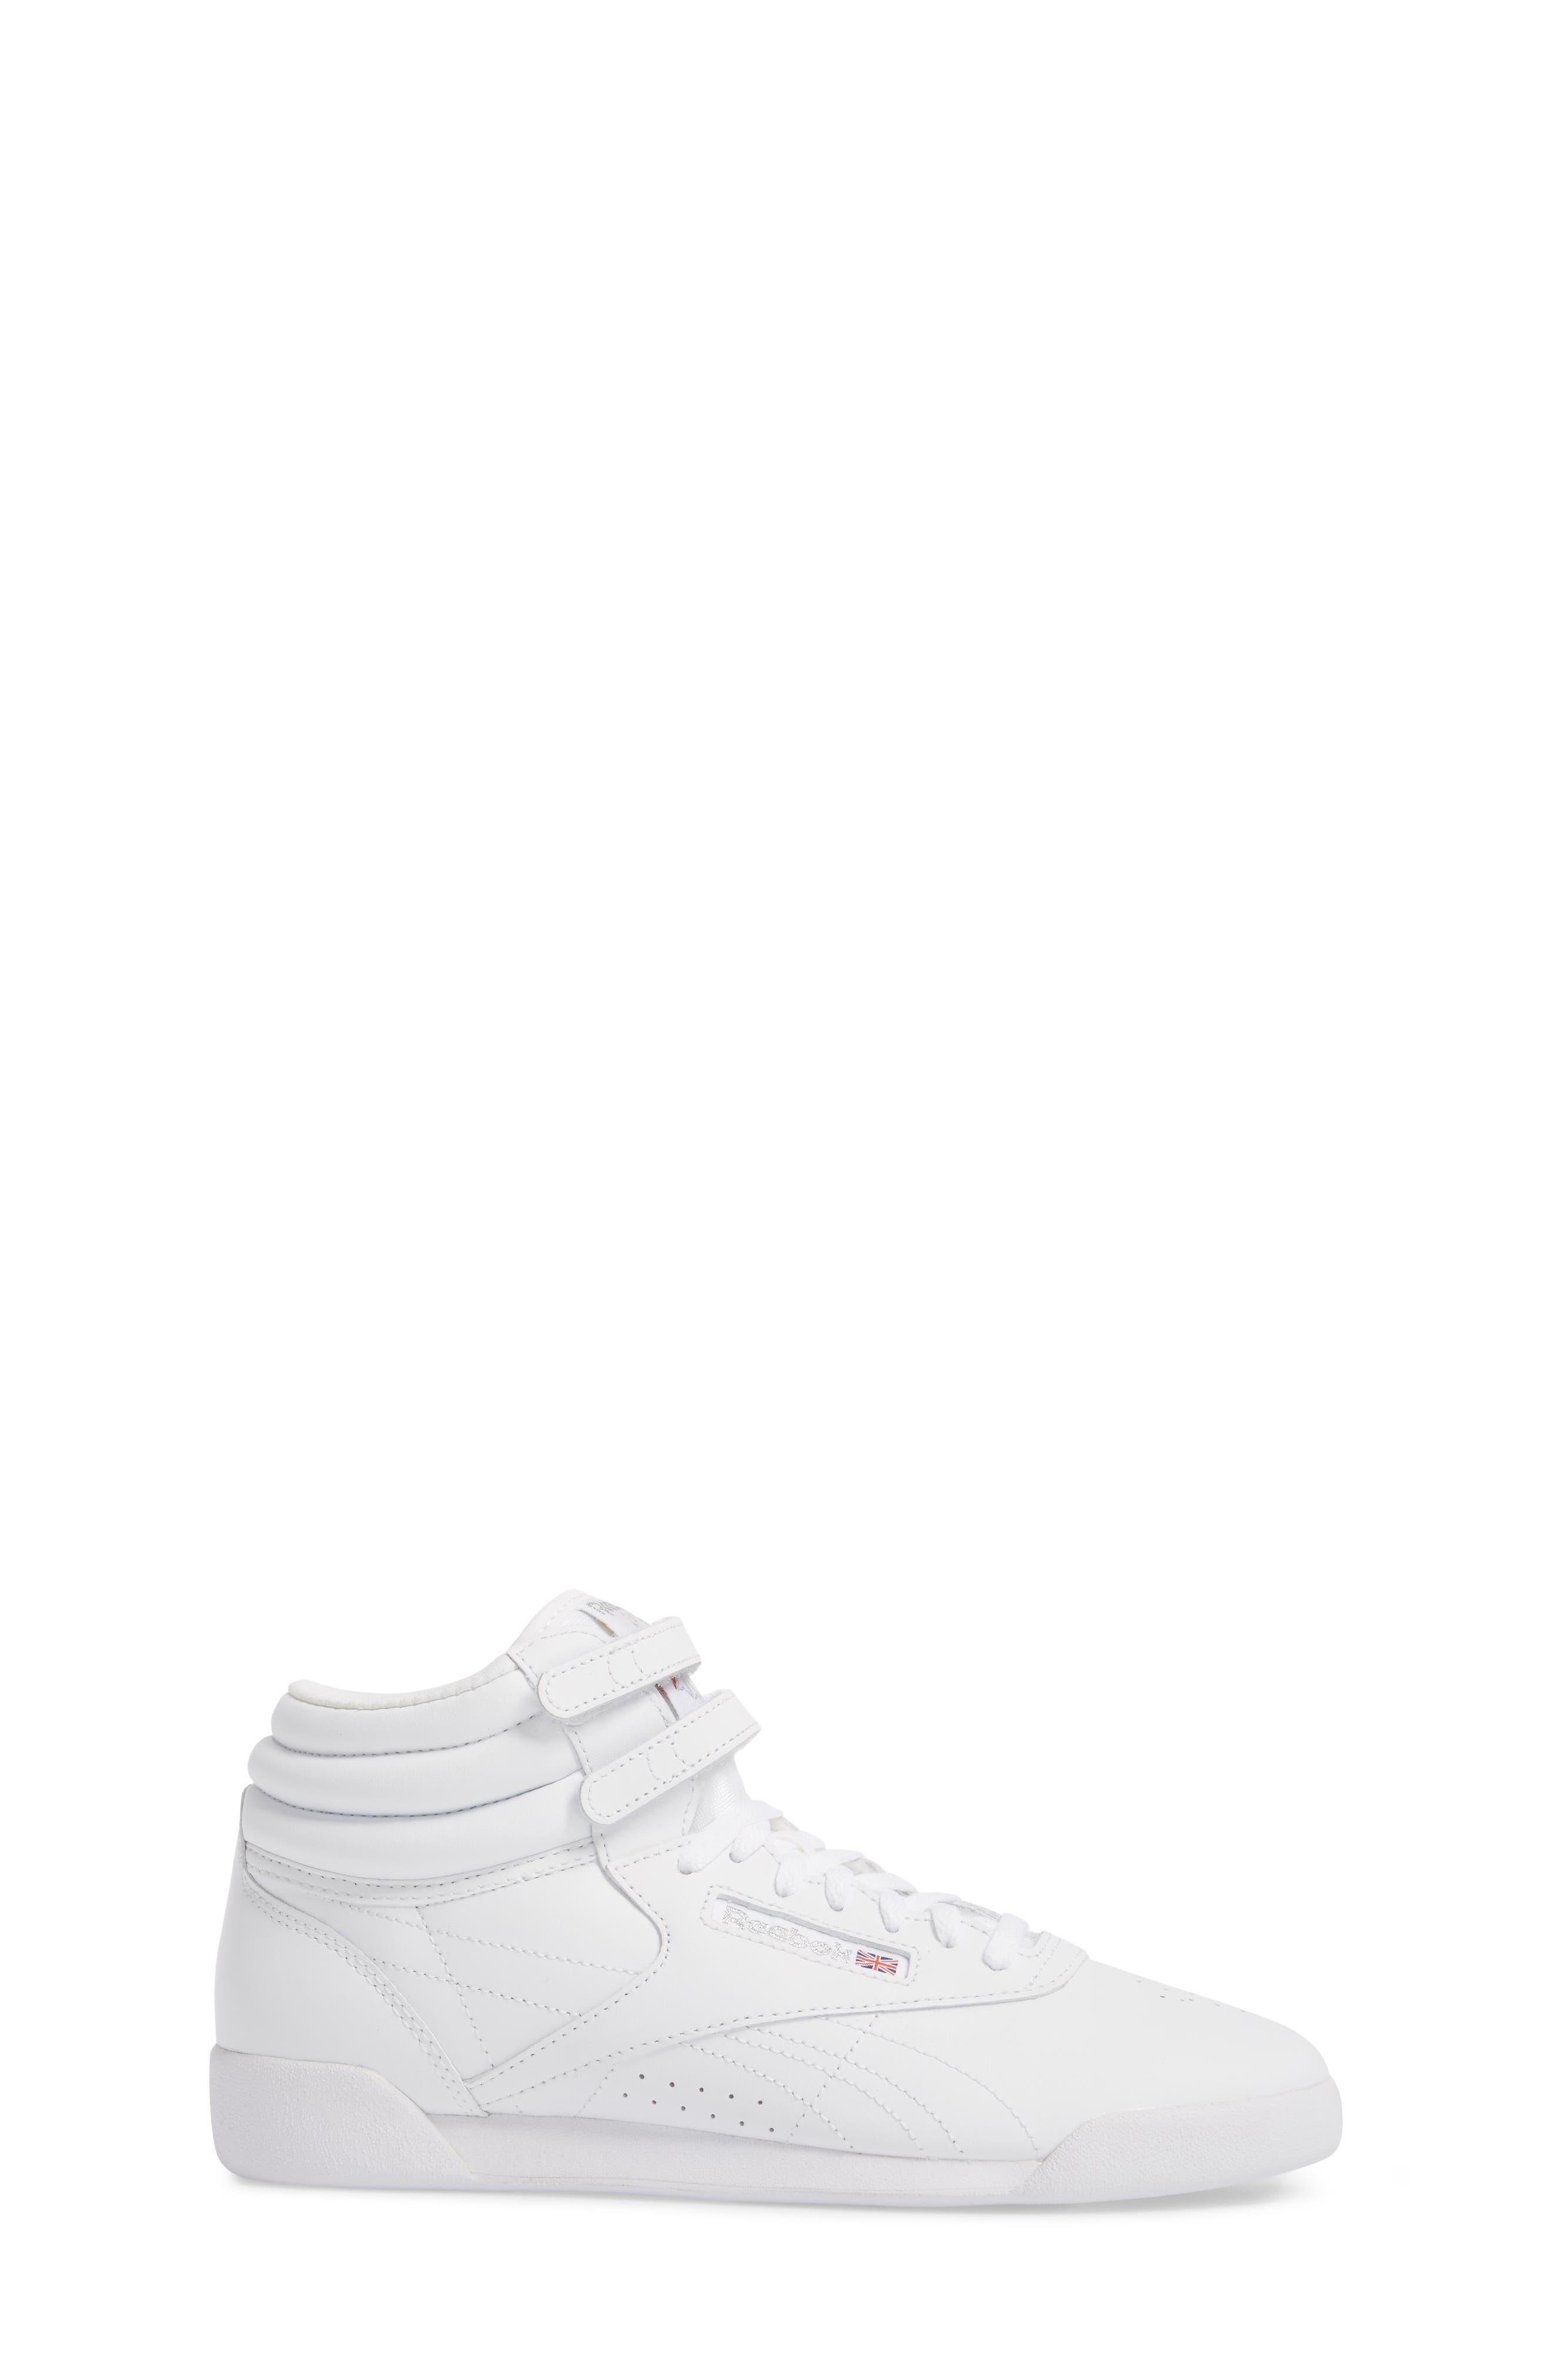 Freestyle Hi Sneaker,                             Alternate thumbnail 3, color,                             White/ Silver